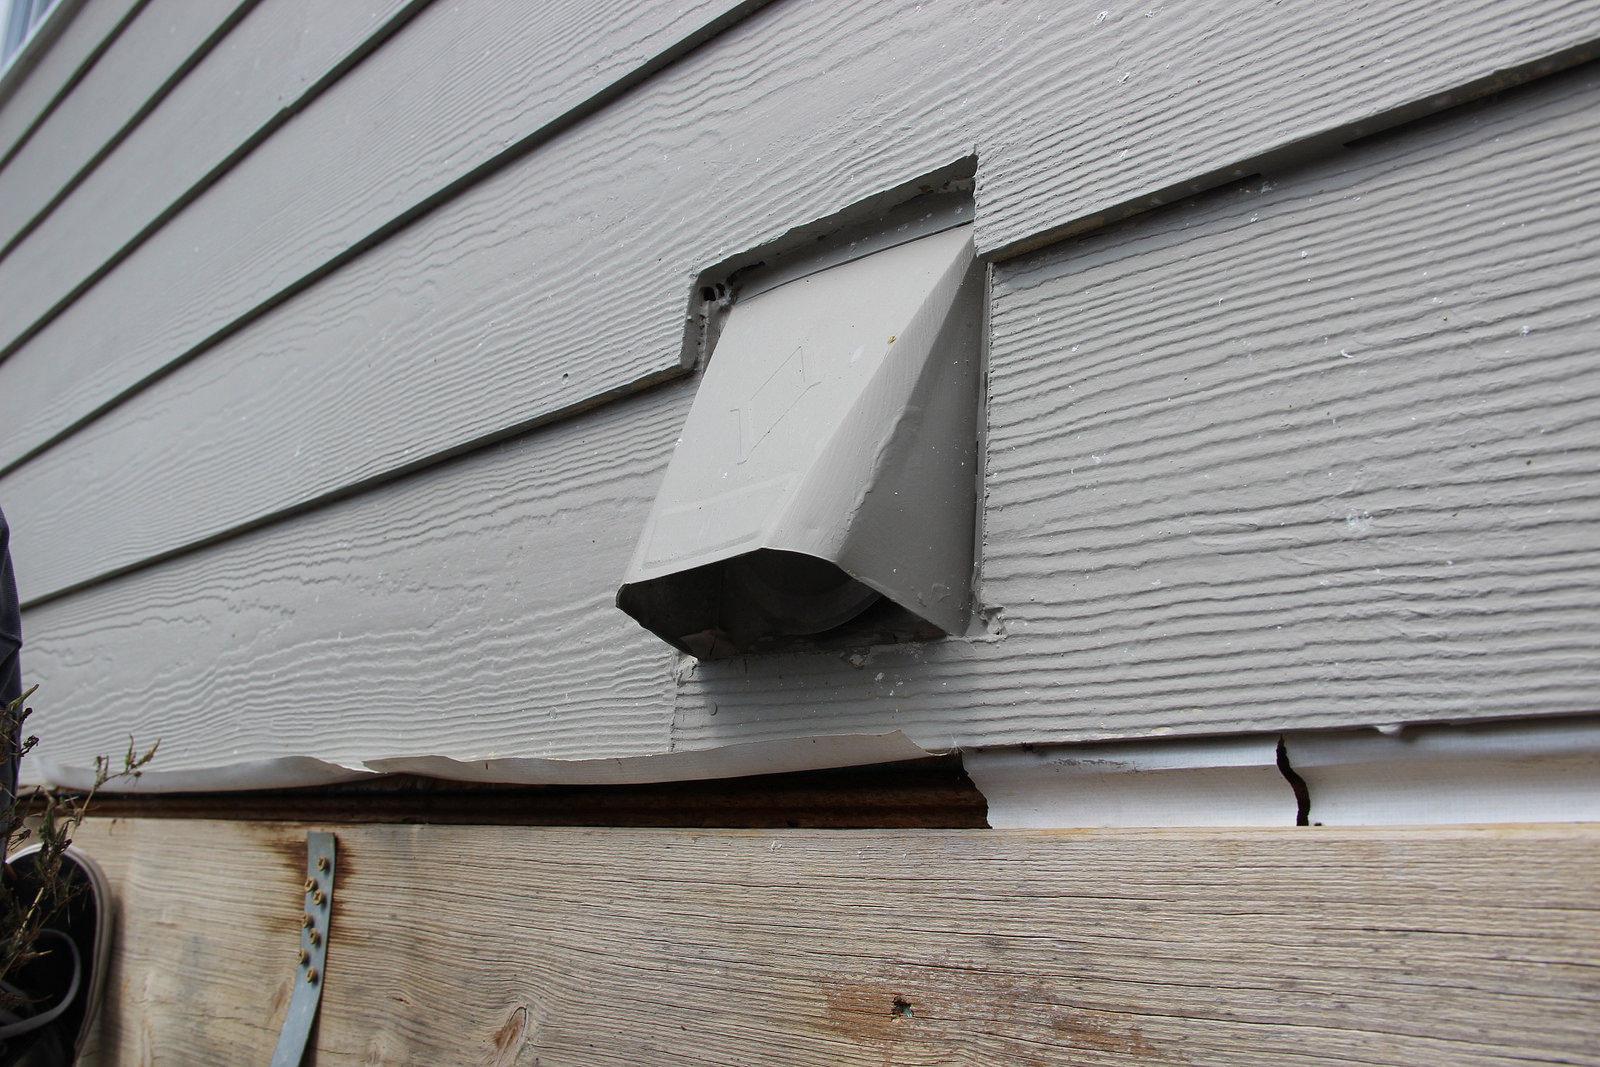 Dryer Vents Can Create A Fire Hazard Appliance Repair